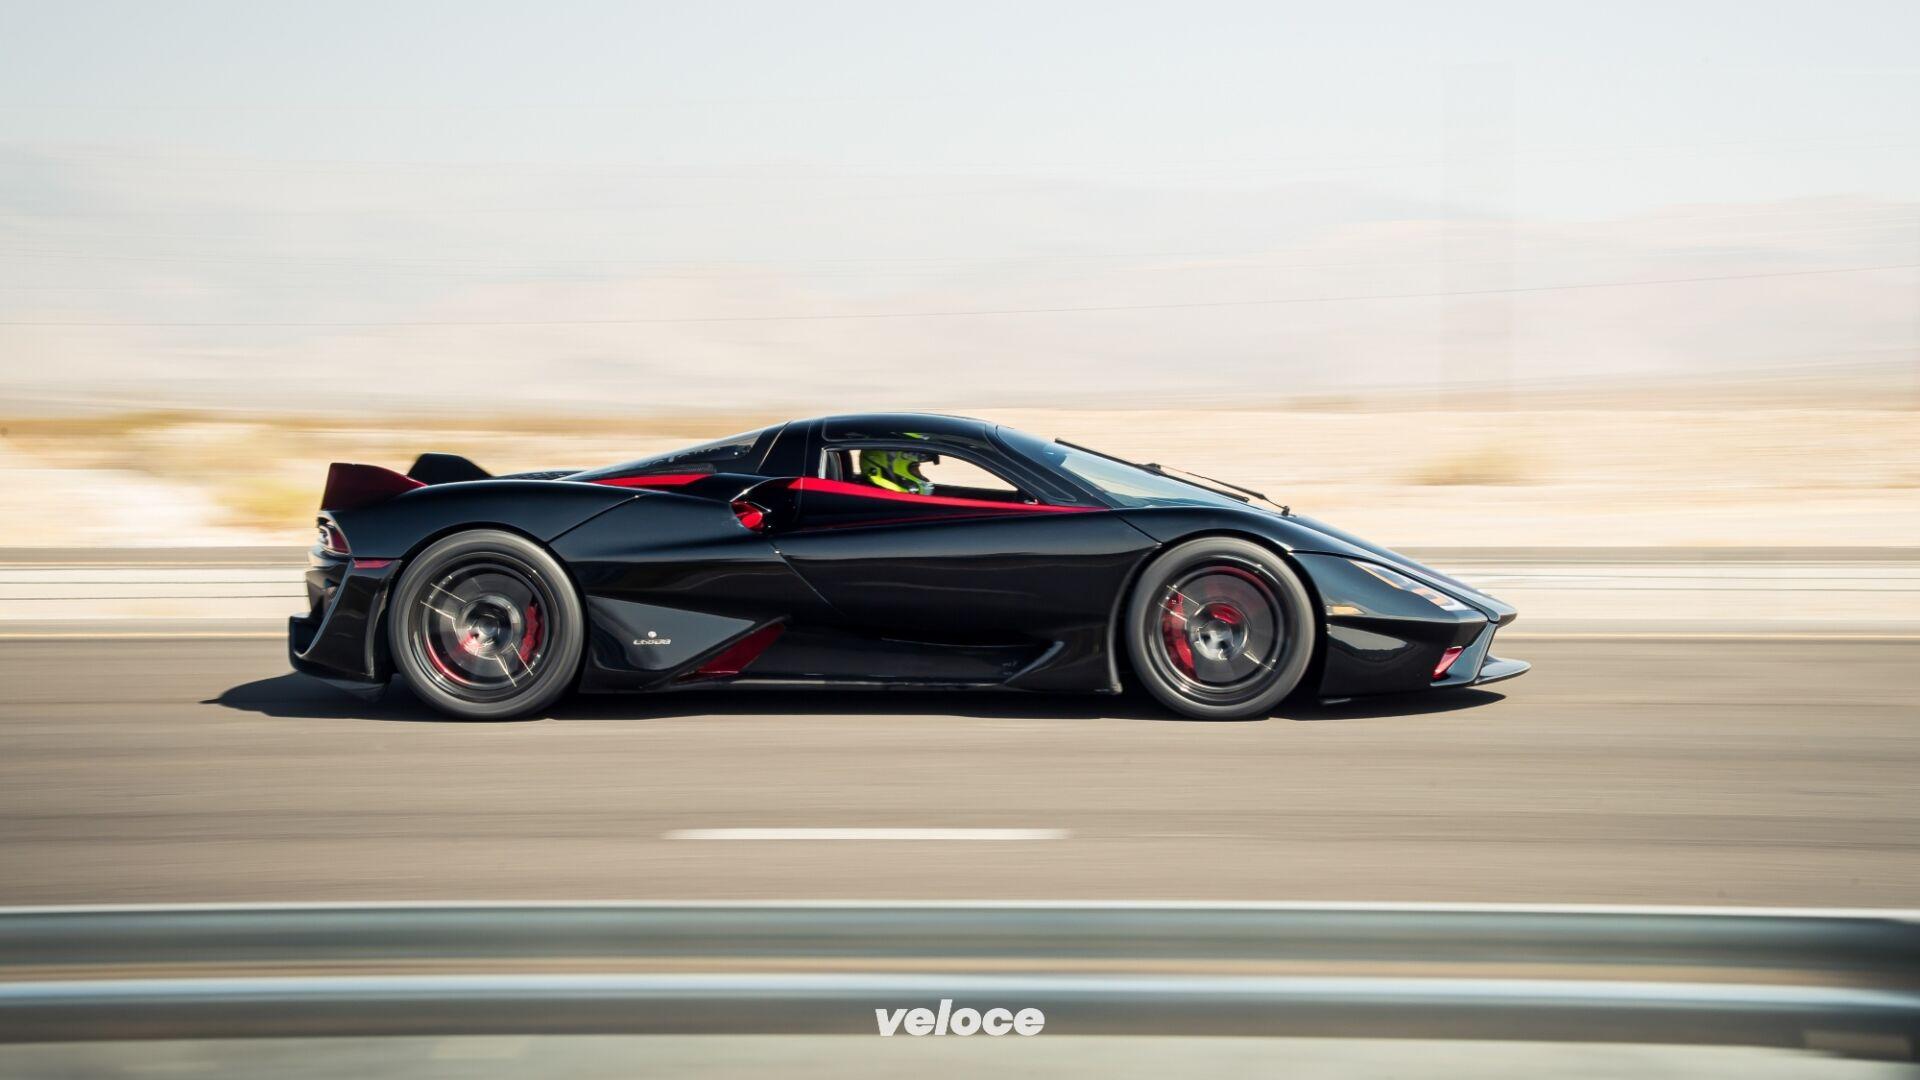 Shelby SSC Tuatara 2020 SSC-Tuatara-record-di-velocità-533-kmh-2-1920x1080